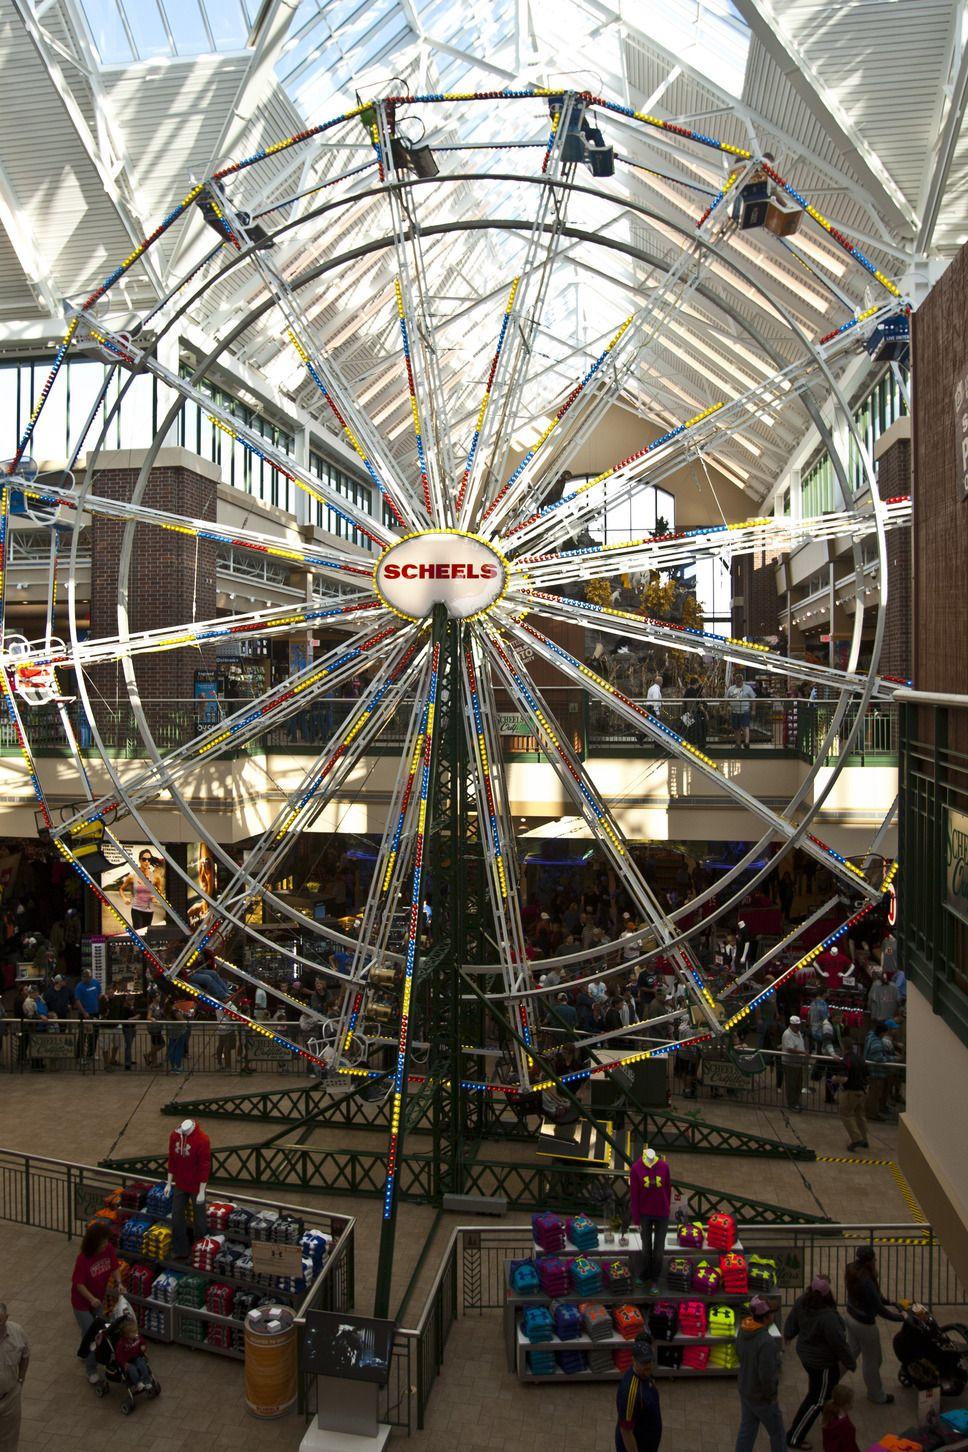 Chris Detrick   The Salt Lake Tribune) The Ferris wheel at